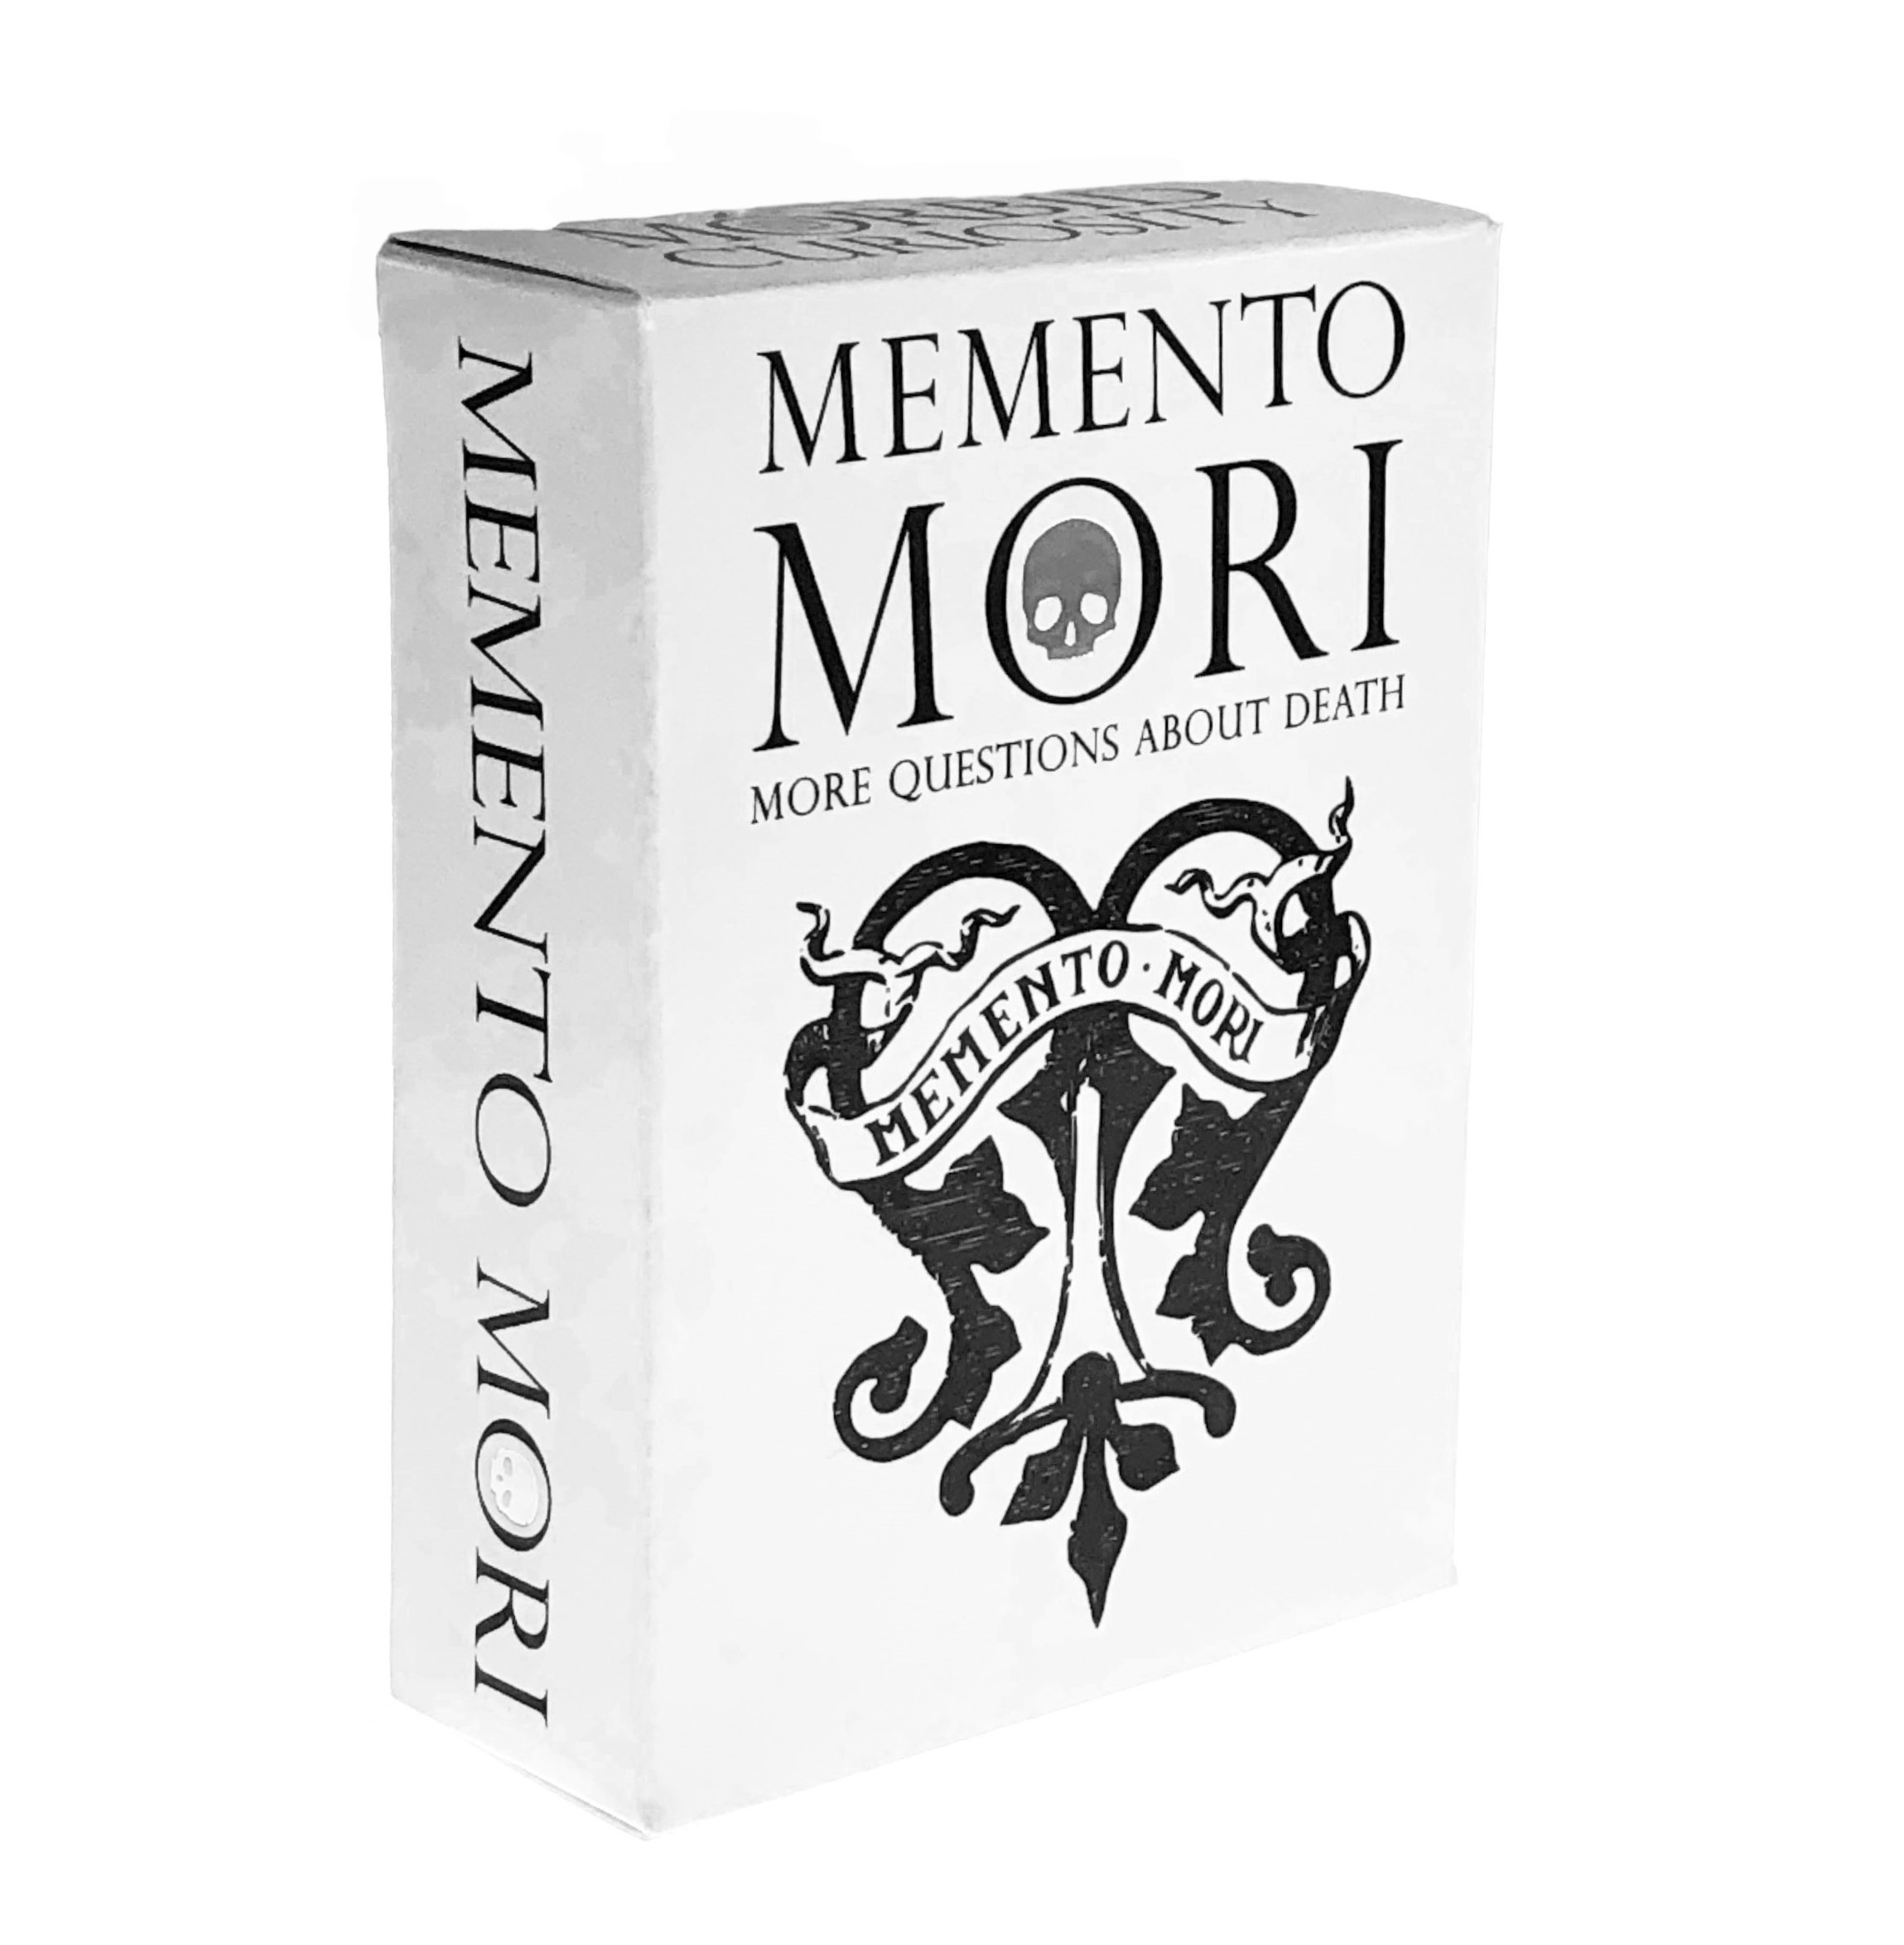 MEMENTO MORI - 72 More Questions About Death$12.99 US